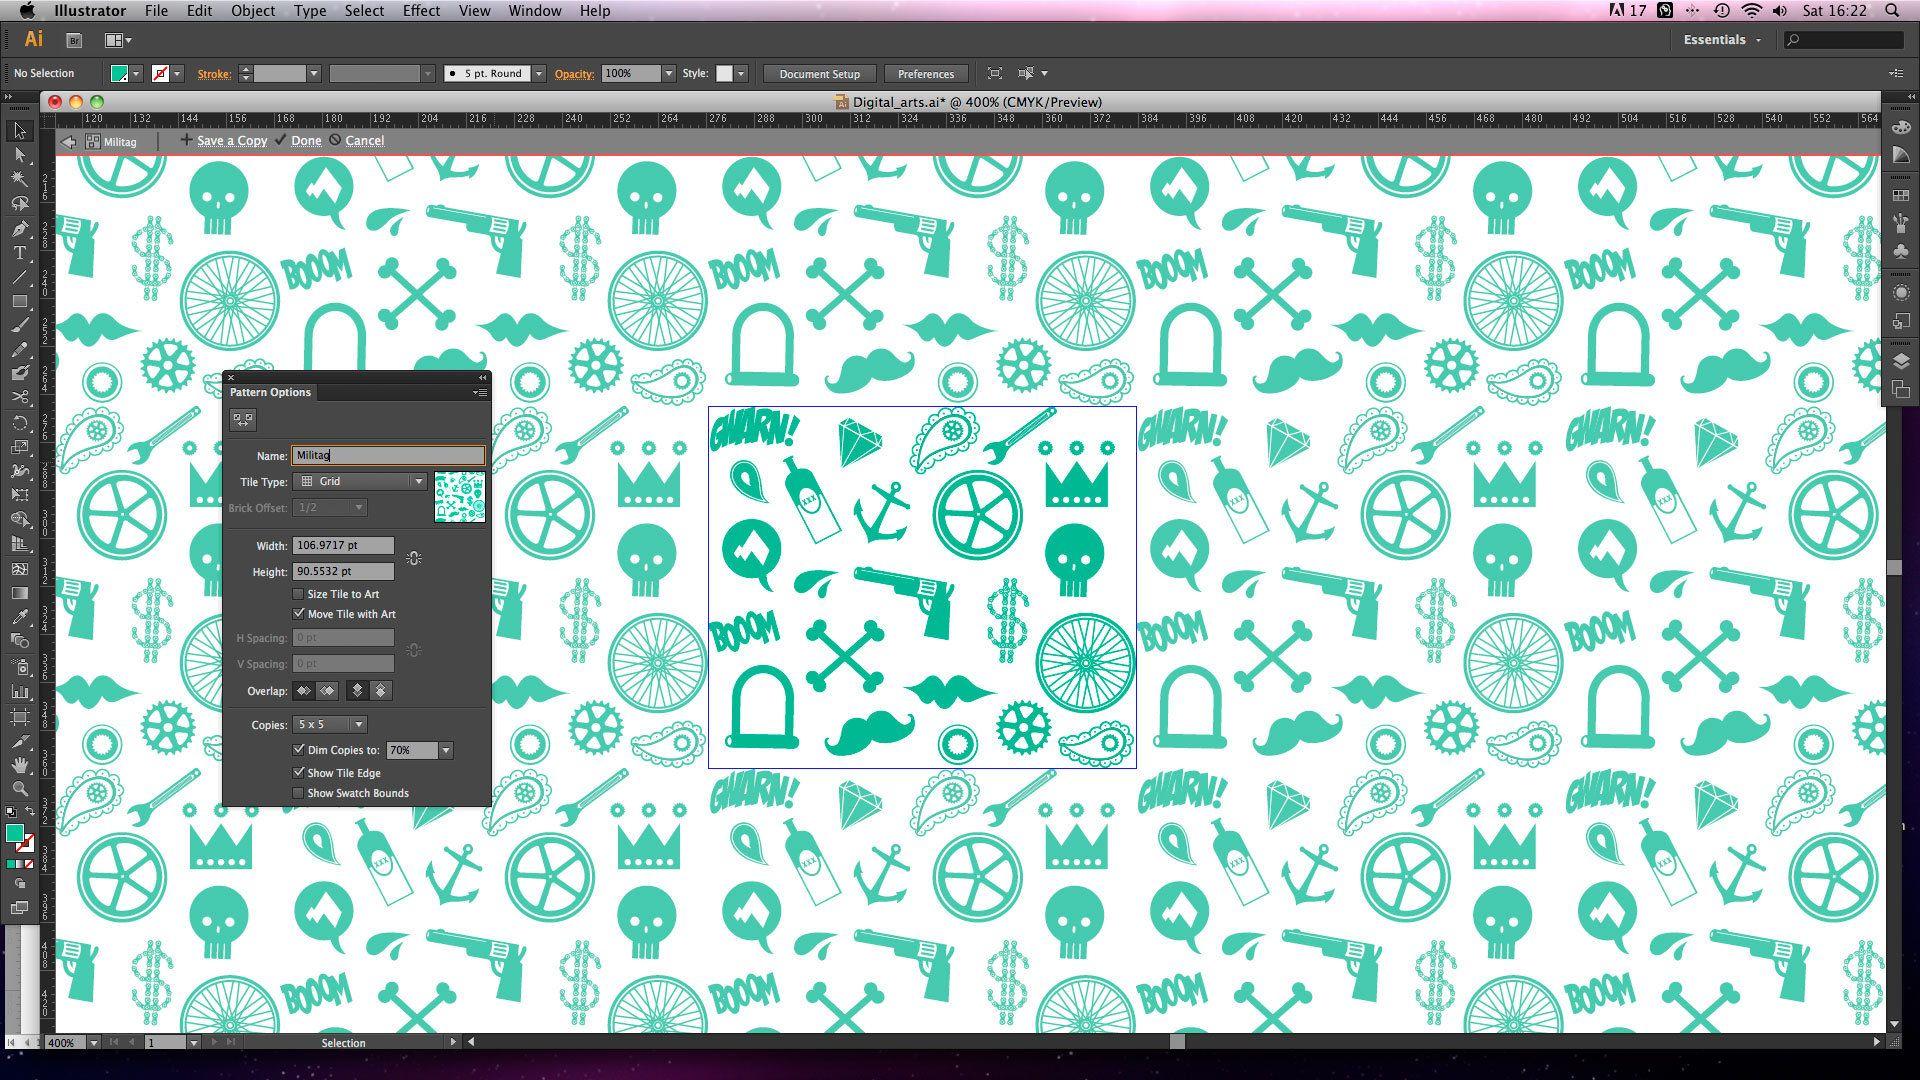 Adobe Illustrator tutorial: Create seamless repeating patterns using  Illustrator CS6's new tools - Digital Arts